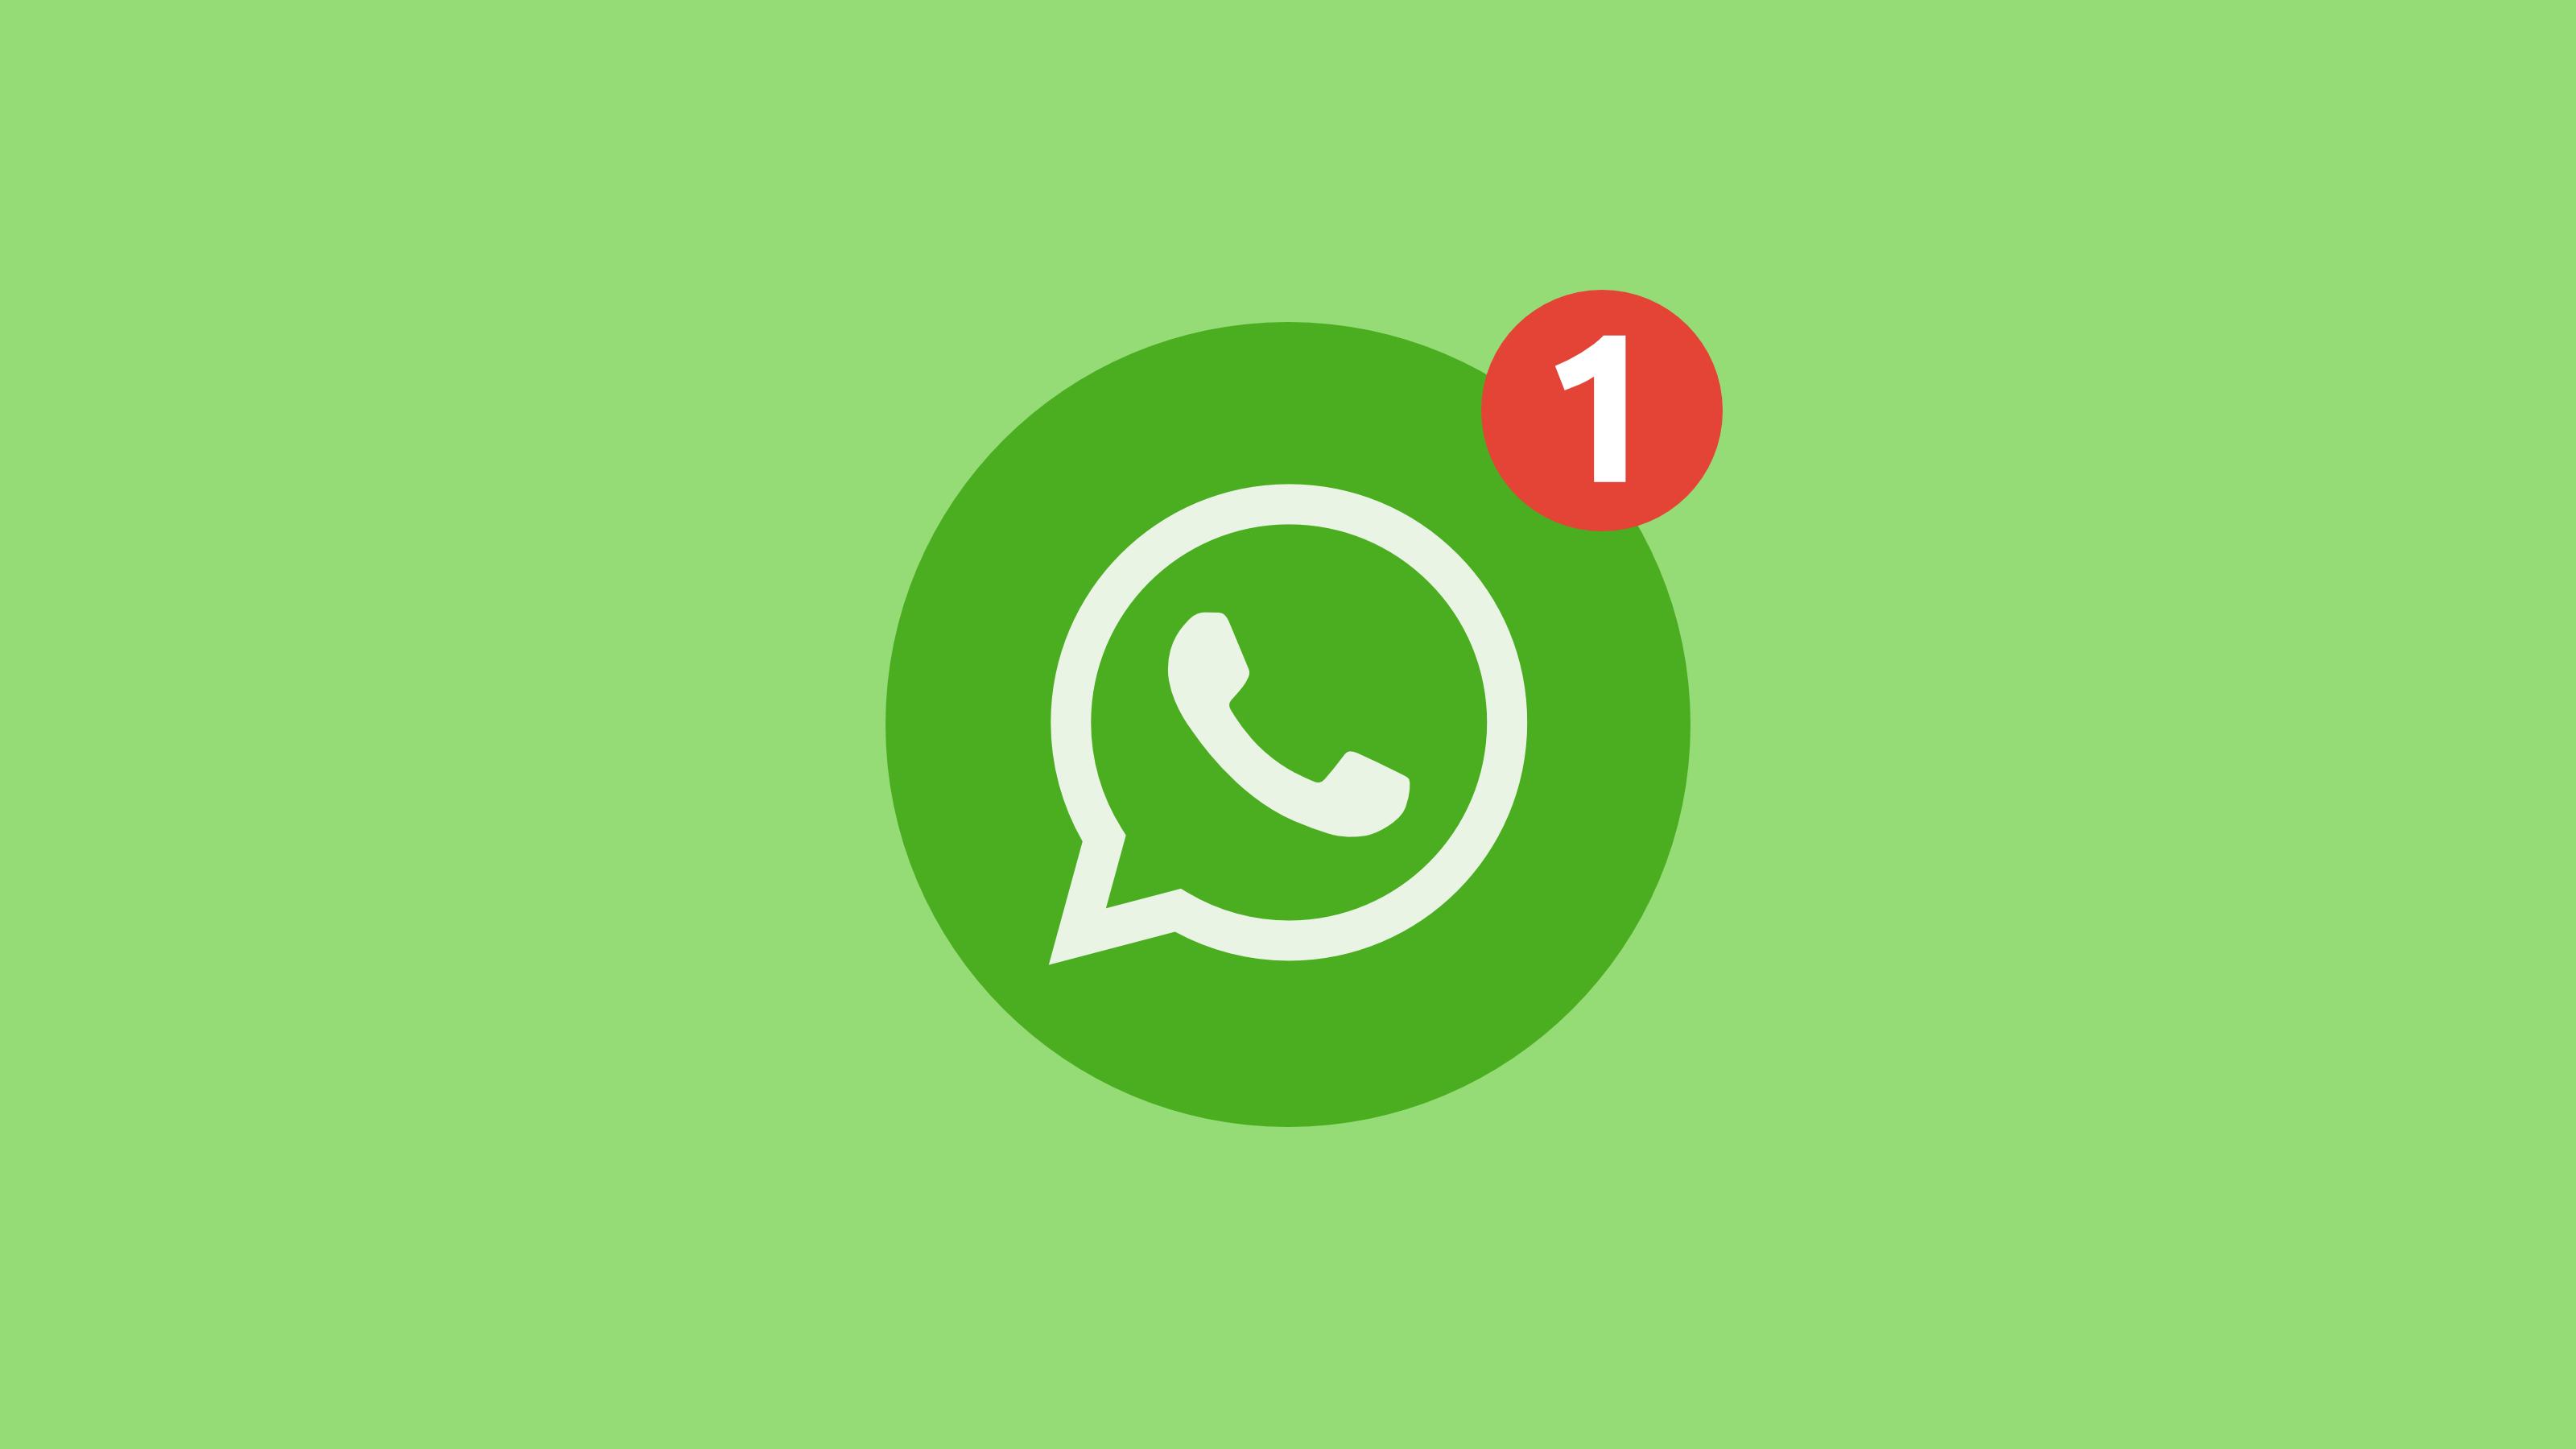 Grupo de whatsApp Vivir en Copenhague